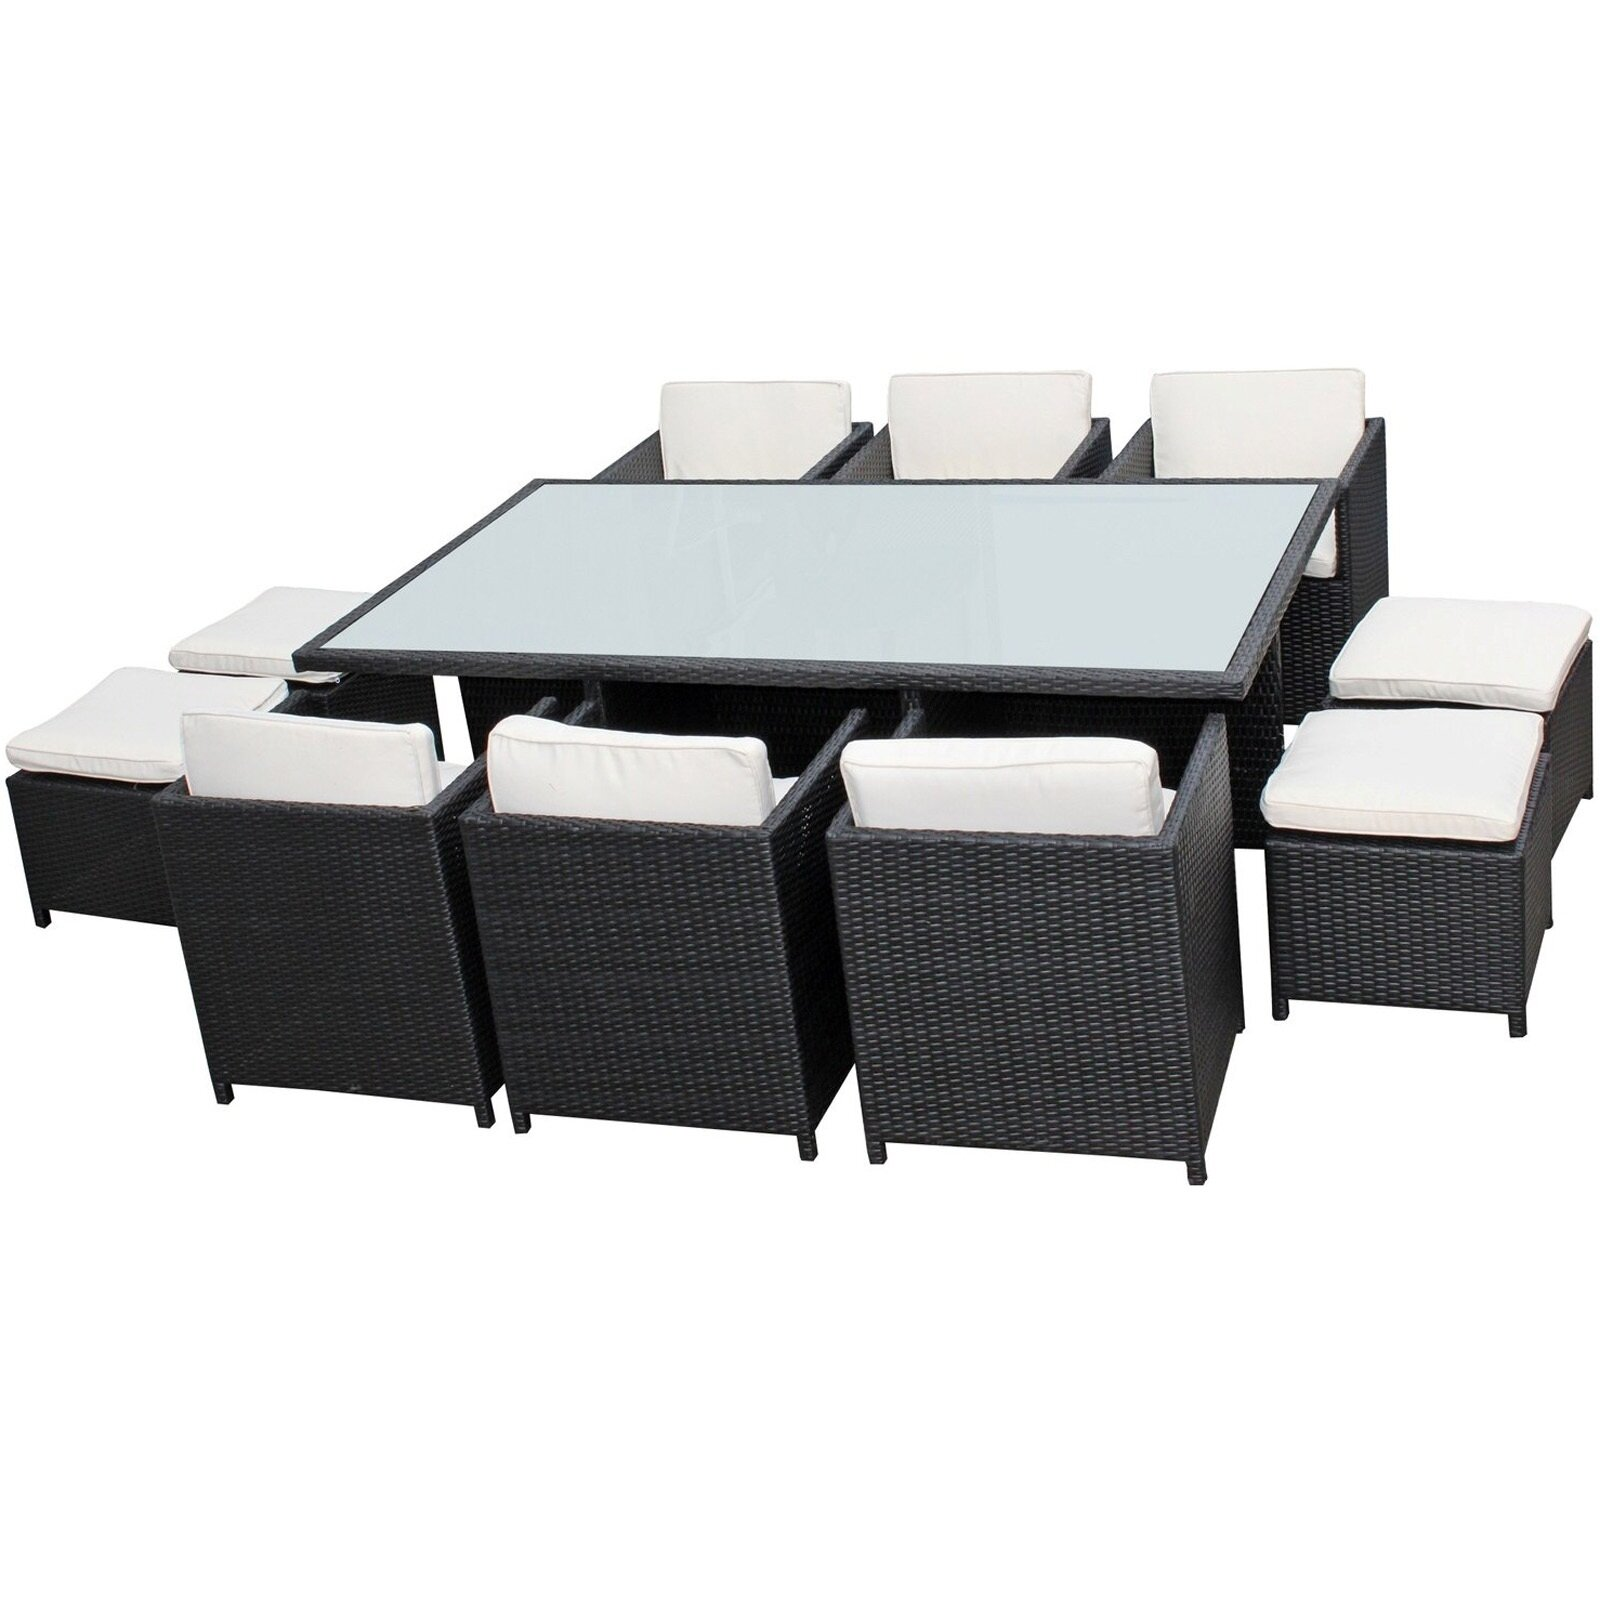 Http Www Wayfair Com Modway Doubleback 11 Piece Outdoor Patio Dining Set Wq6744 Fow1024 Html